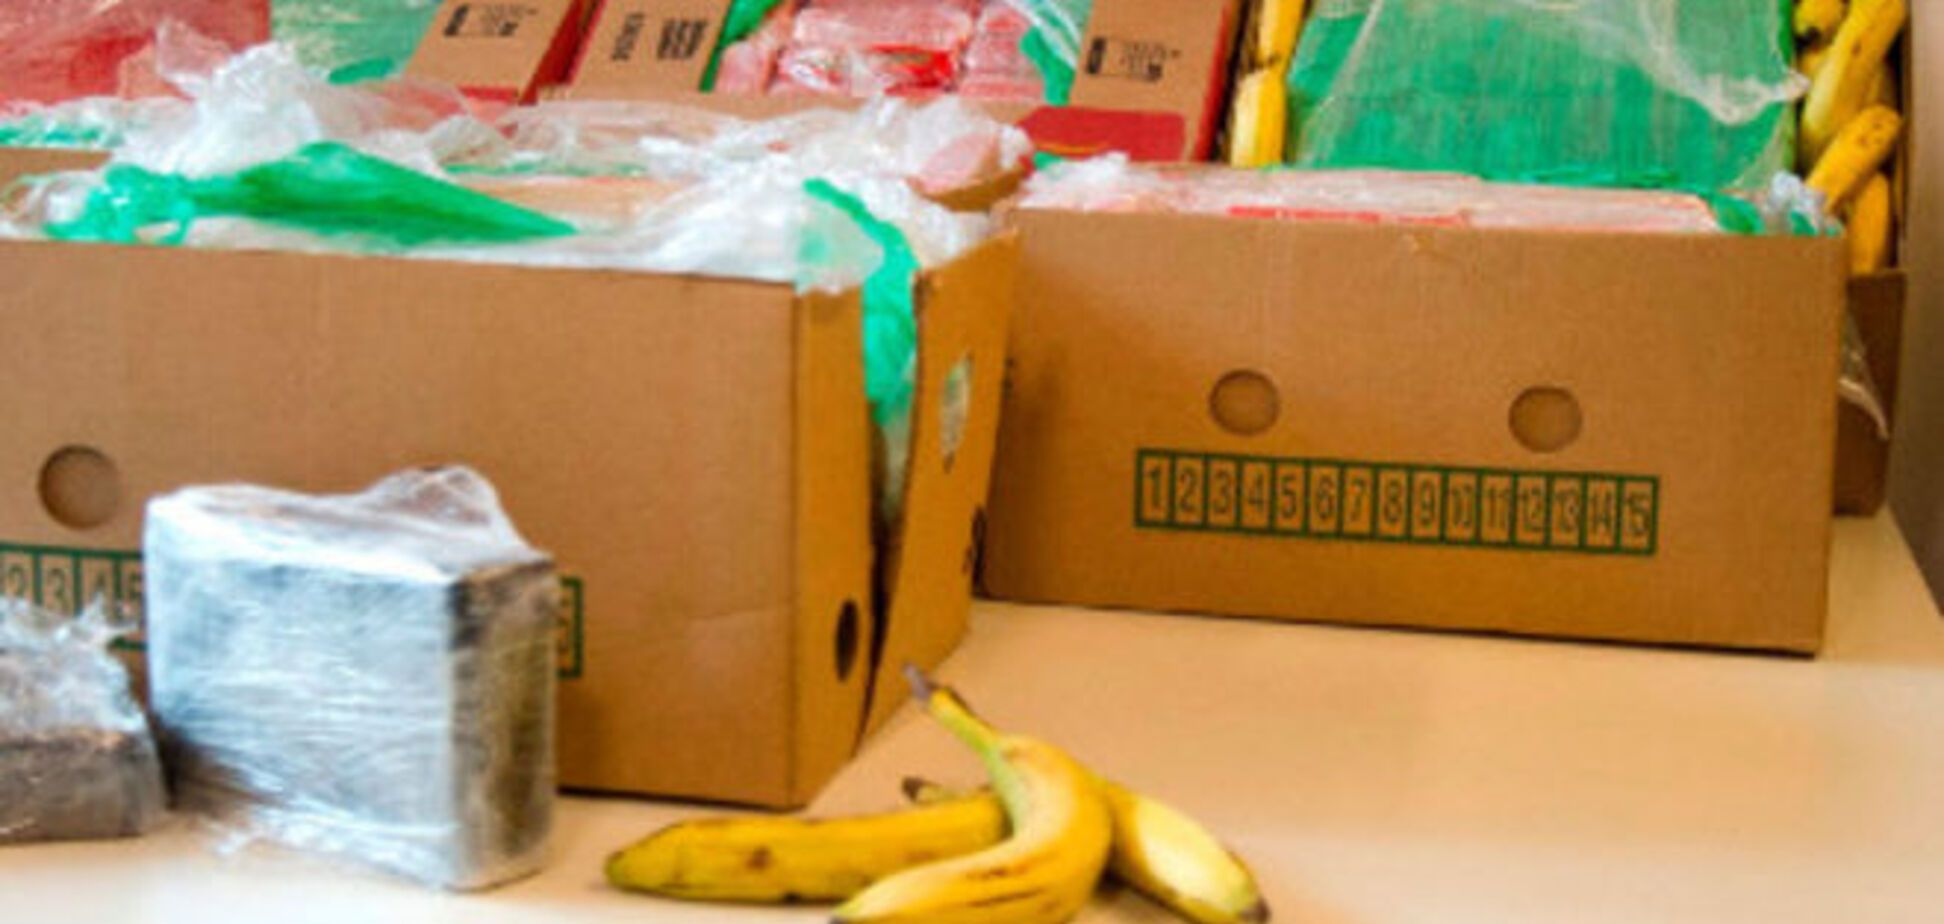 В парижский 'Ашан' вместо бананов завезли кокаин